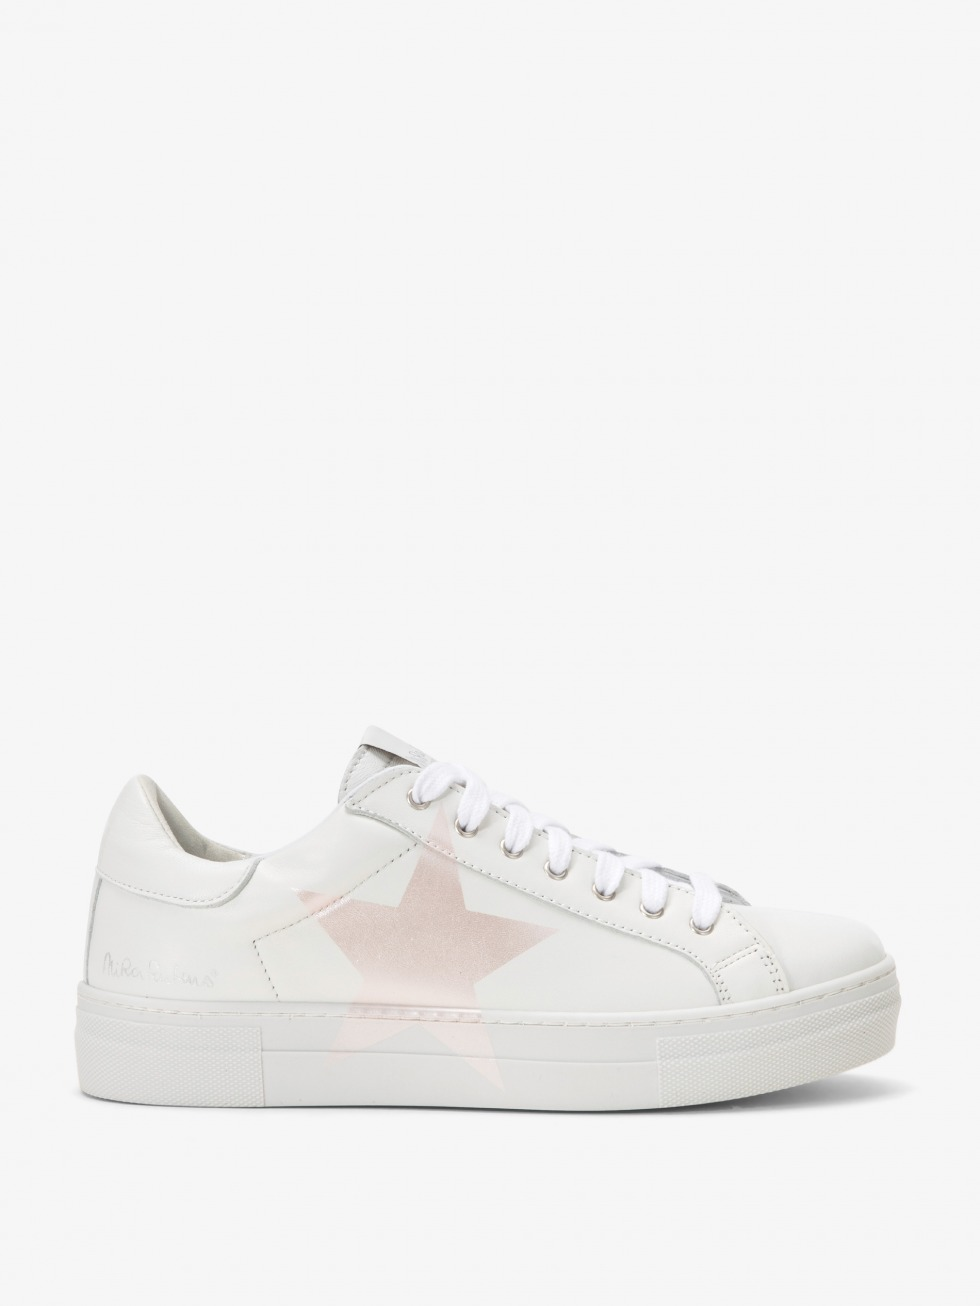 53a5681023 Sneakers Martini Bianco - Stella Rose Madreperla